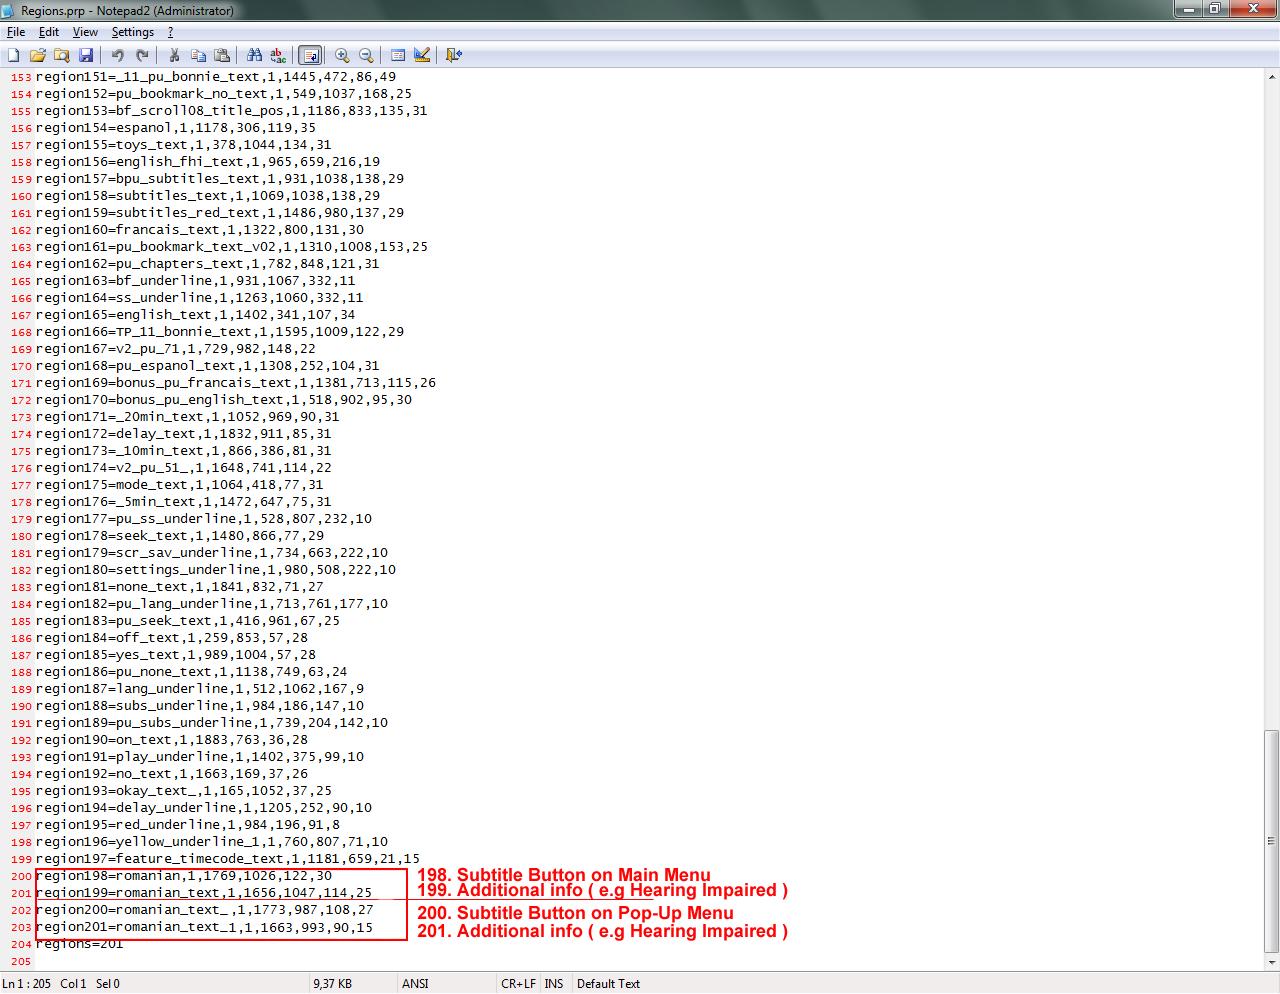 menu_same_coordinates_4_regions.png